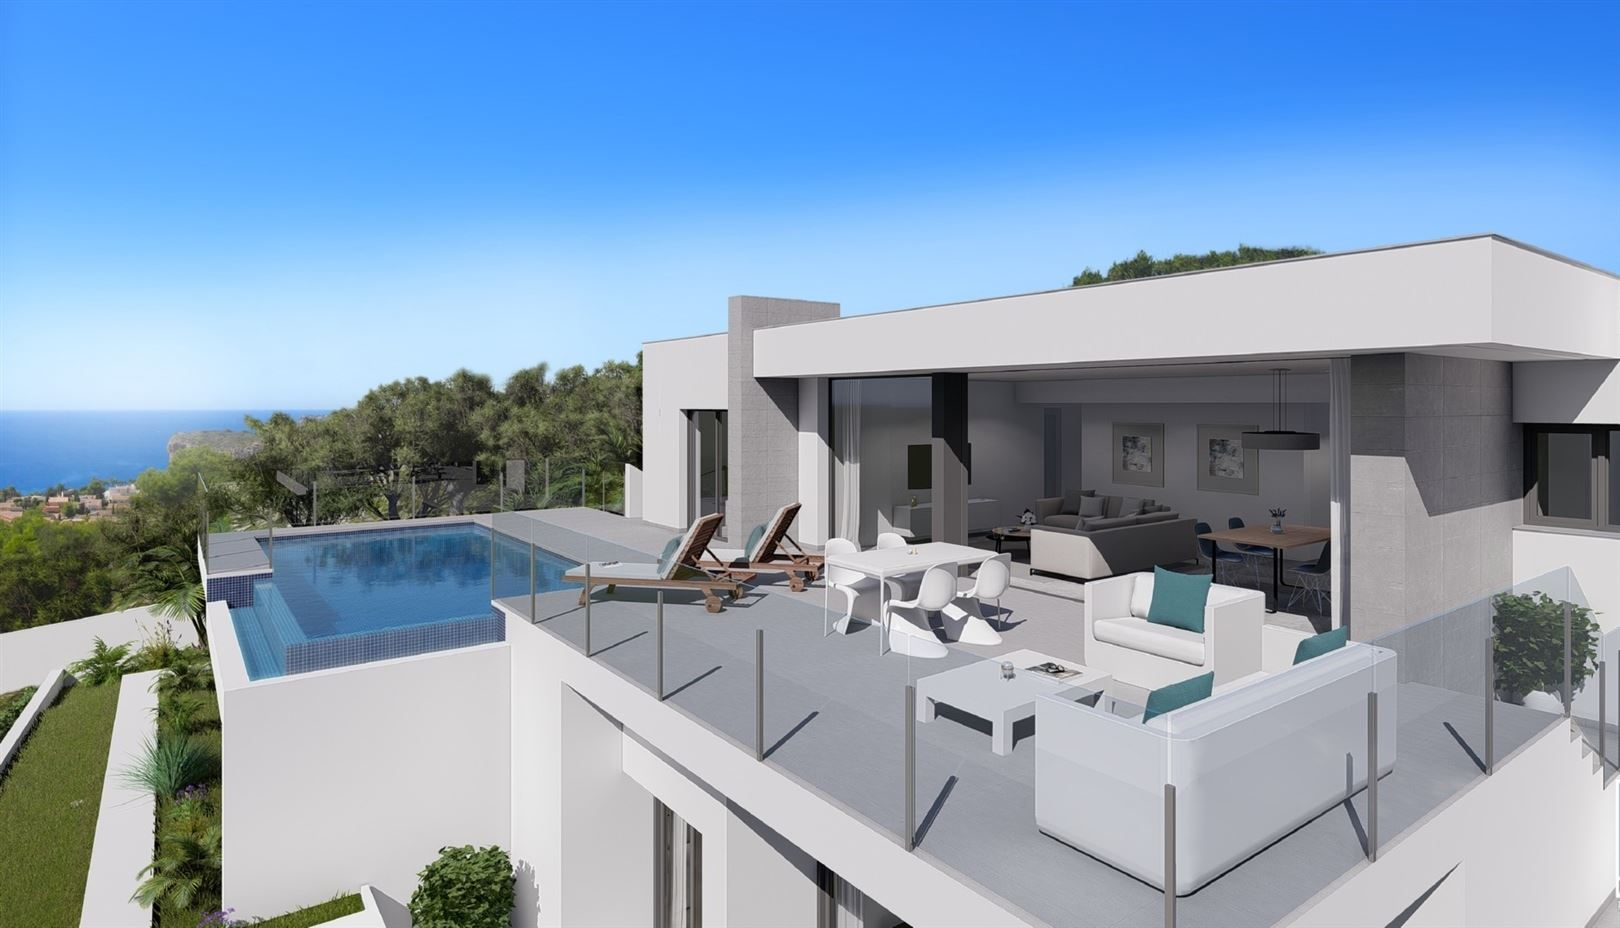 Foto 4 : Villa te   (Spanje) - Prijs € 735.000